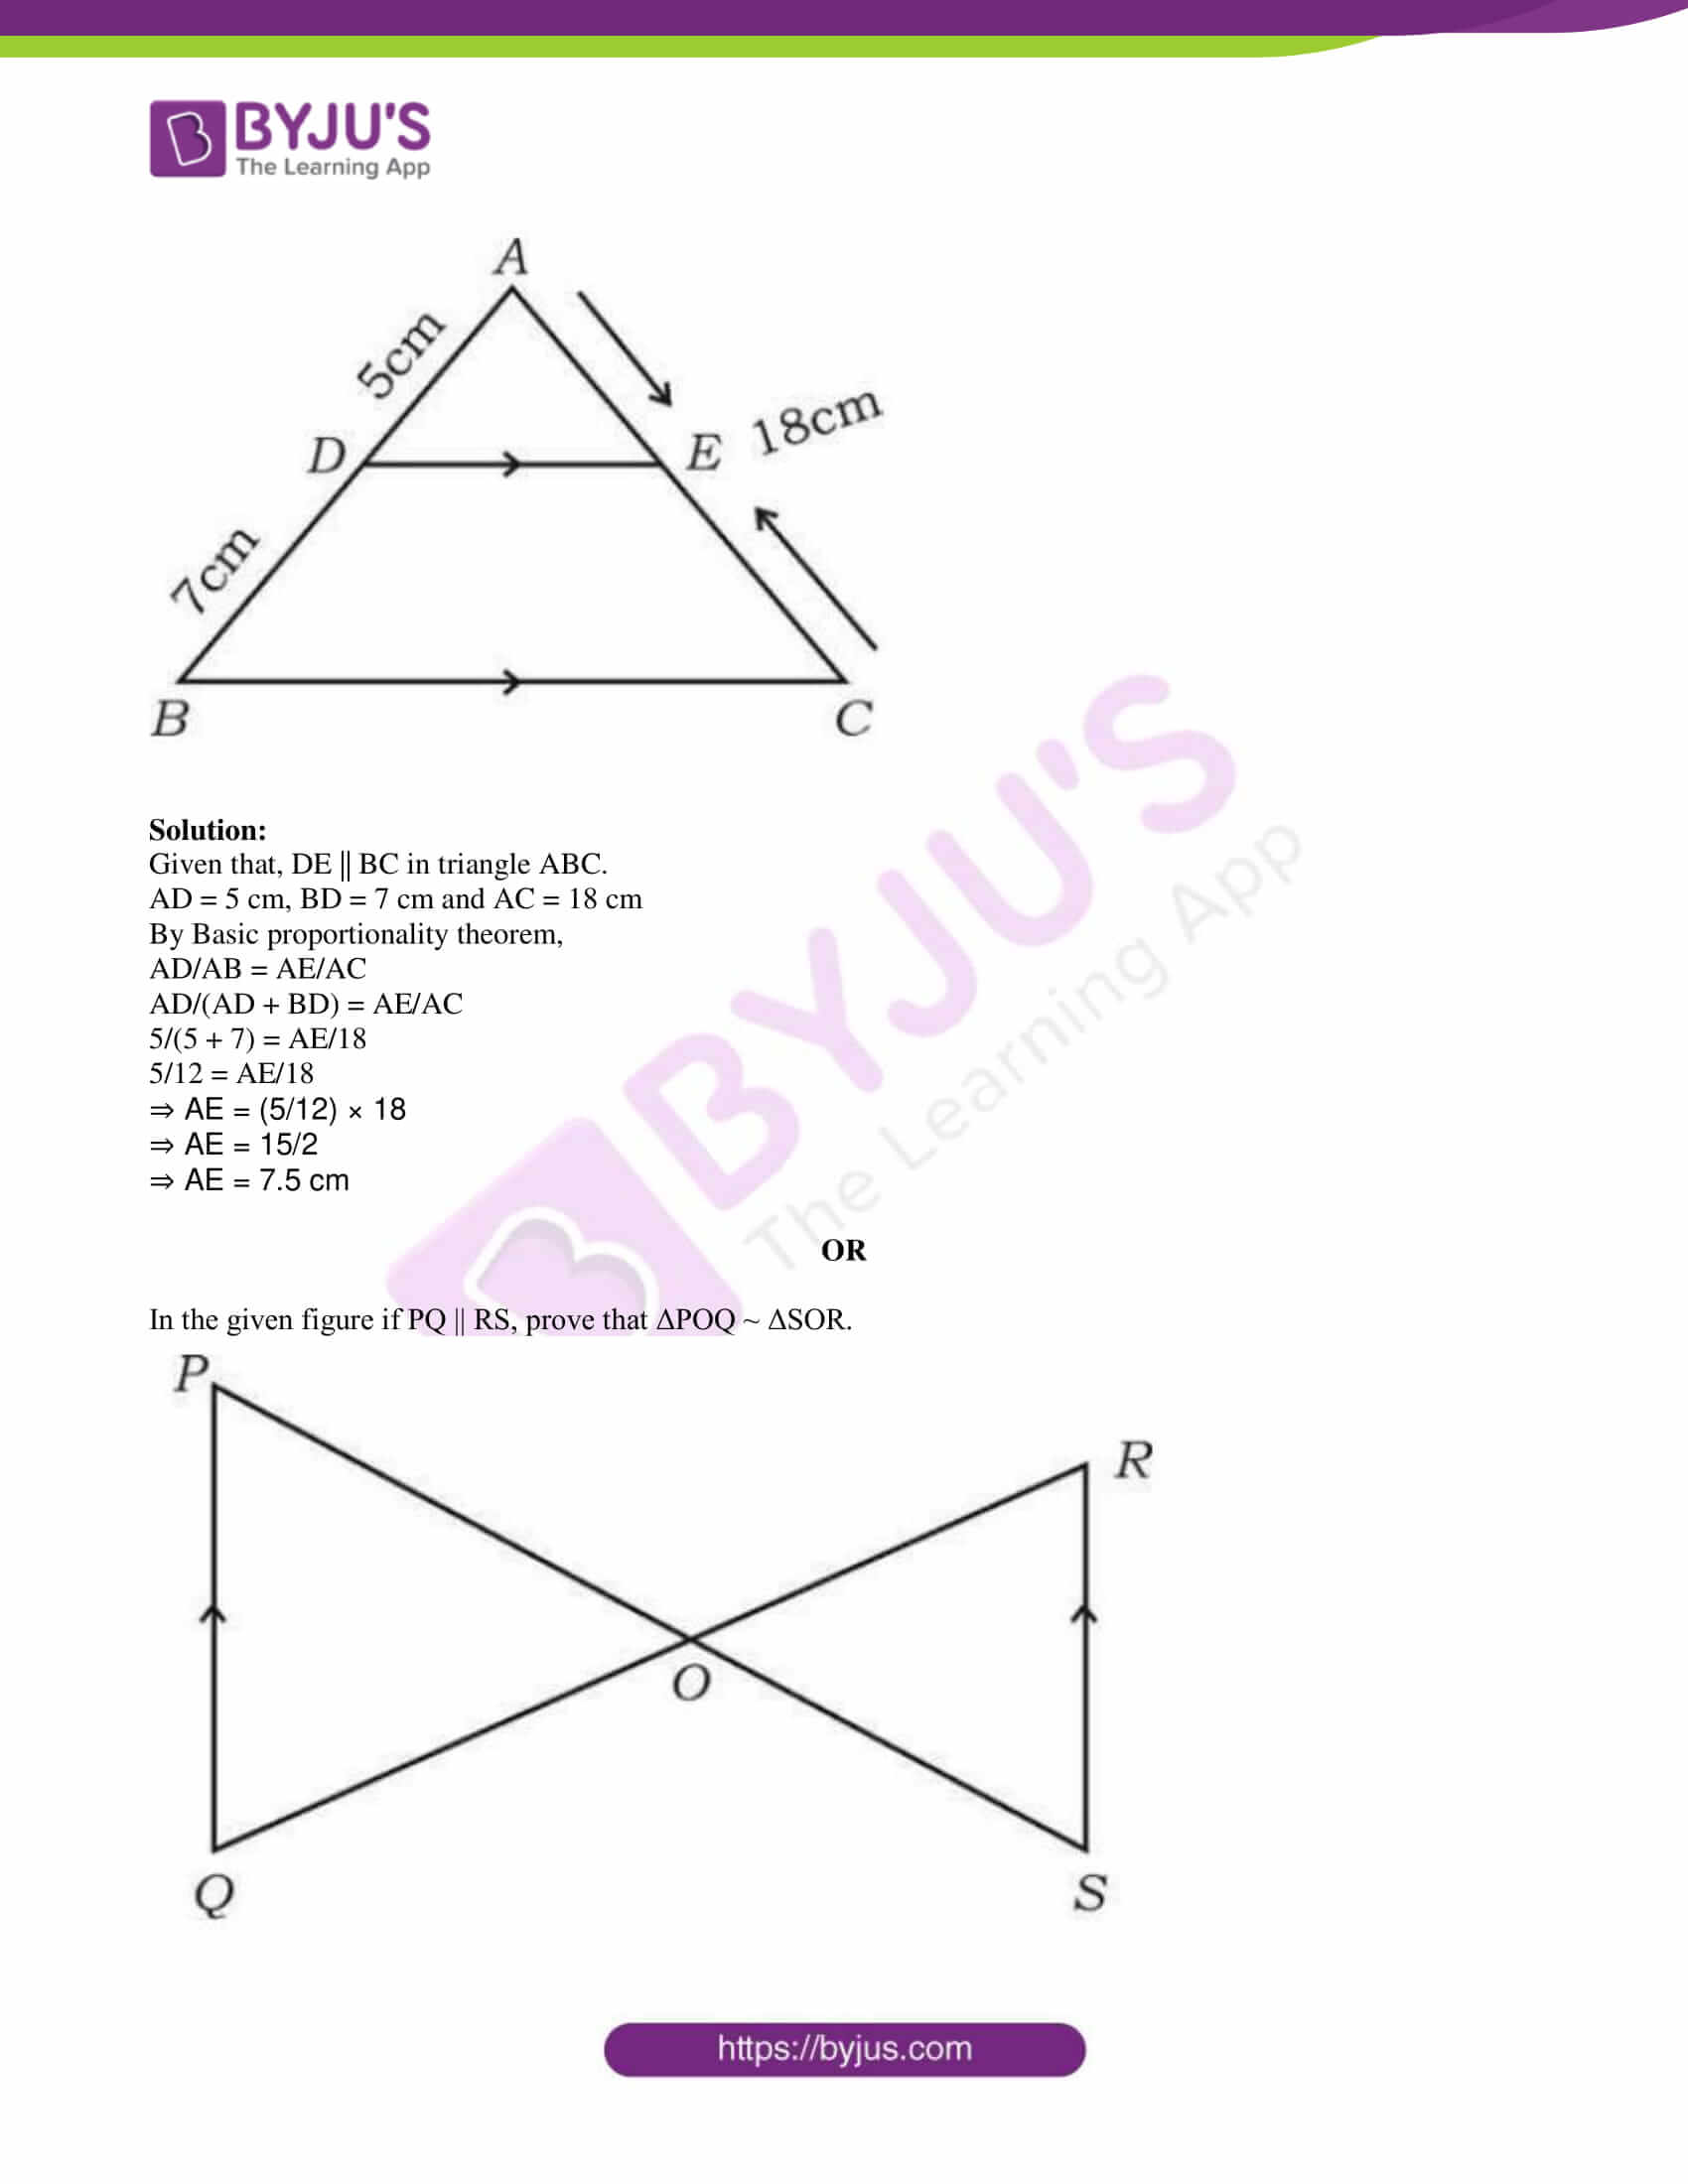 kseeb class 10 maths question paper solution 2019 07